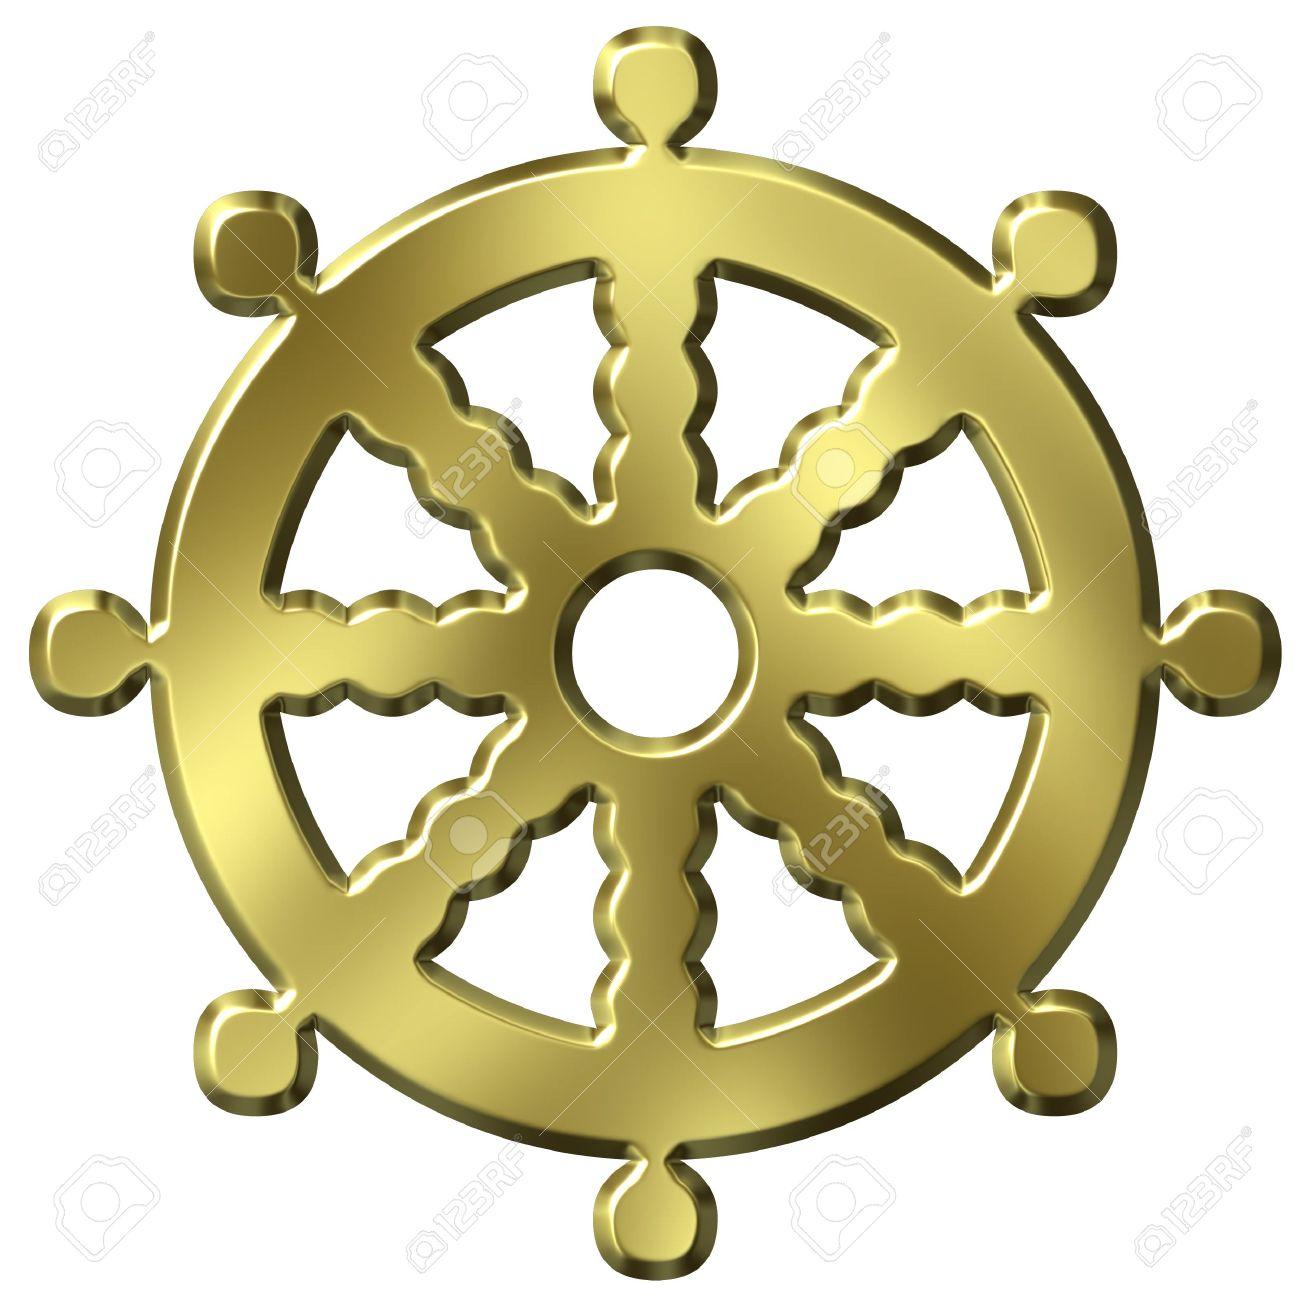 3d golden buddhism symbol wheel of life stock photo picture and 3d golden buddhism symbol wheel of life stock photo 1771605 biocorpaavc